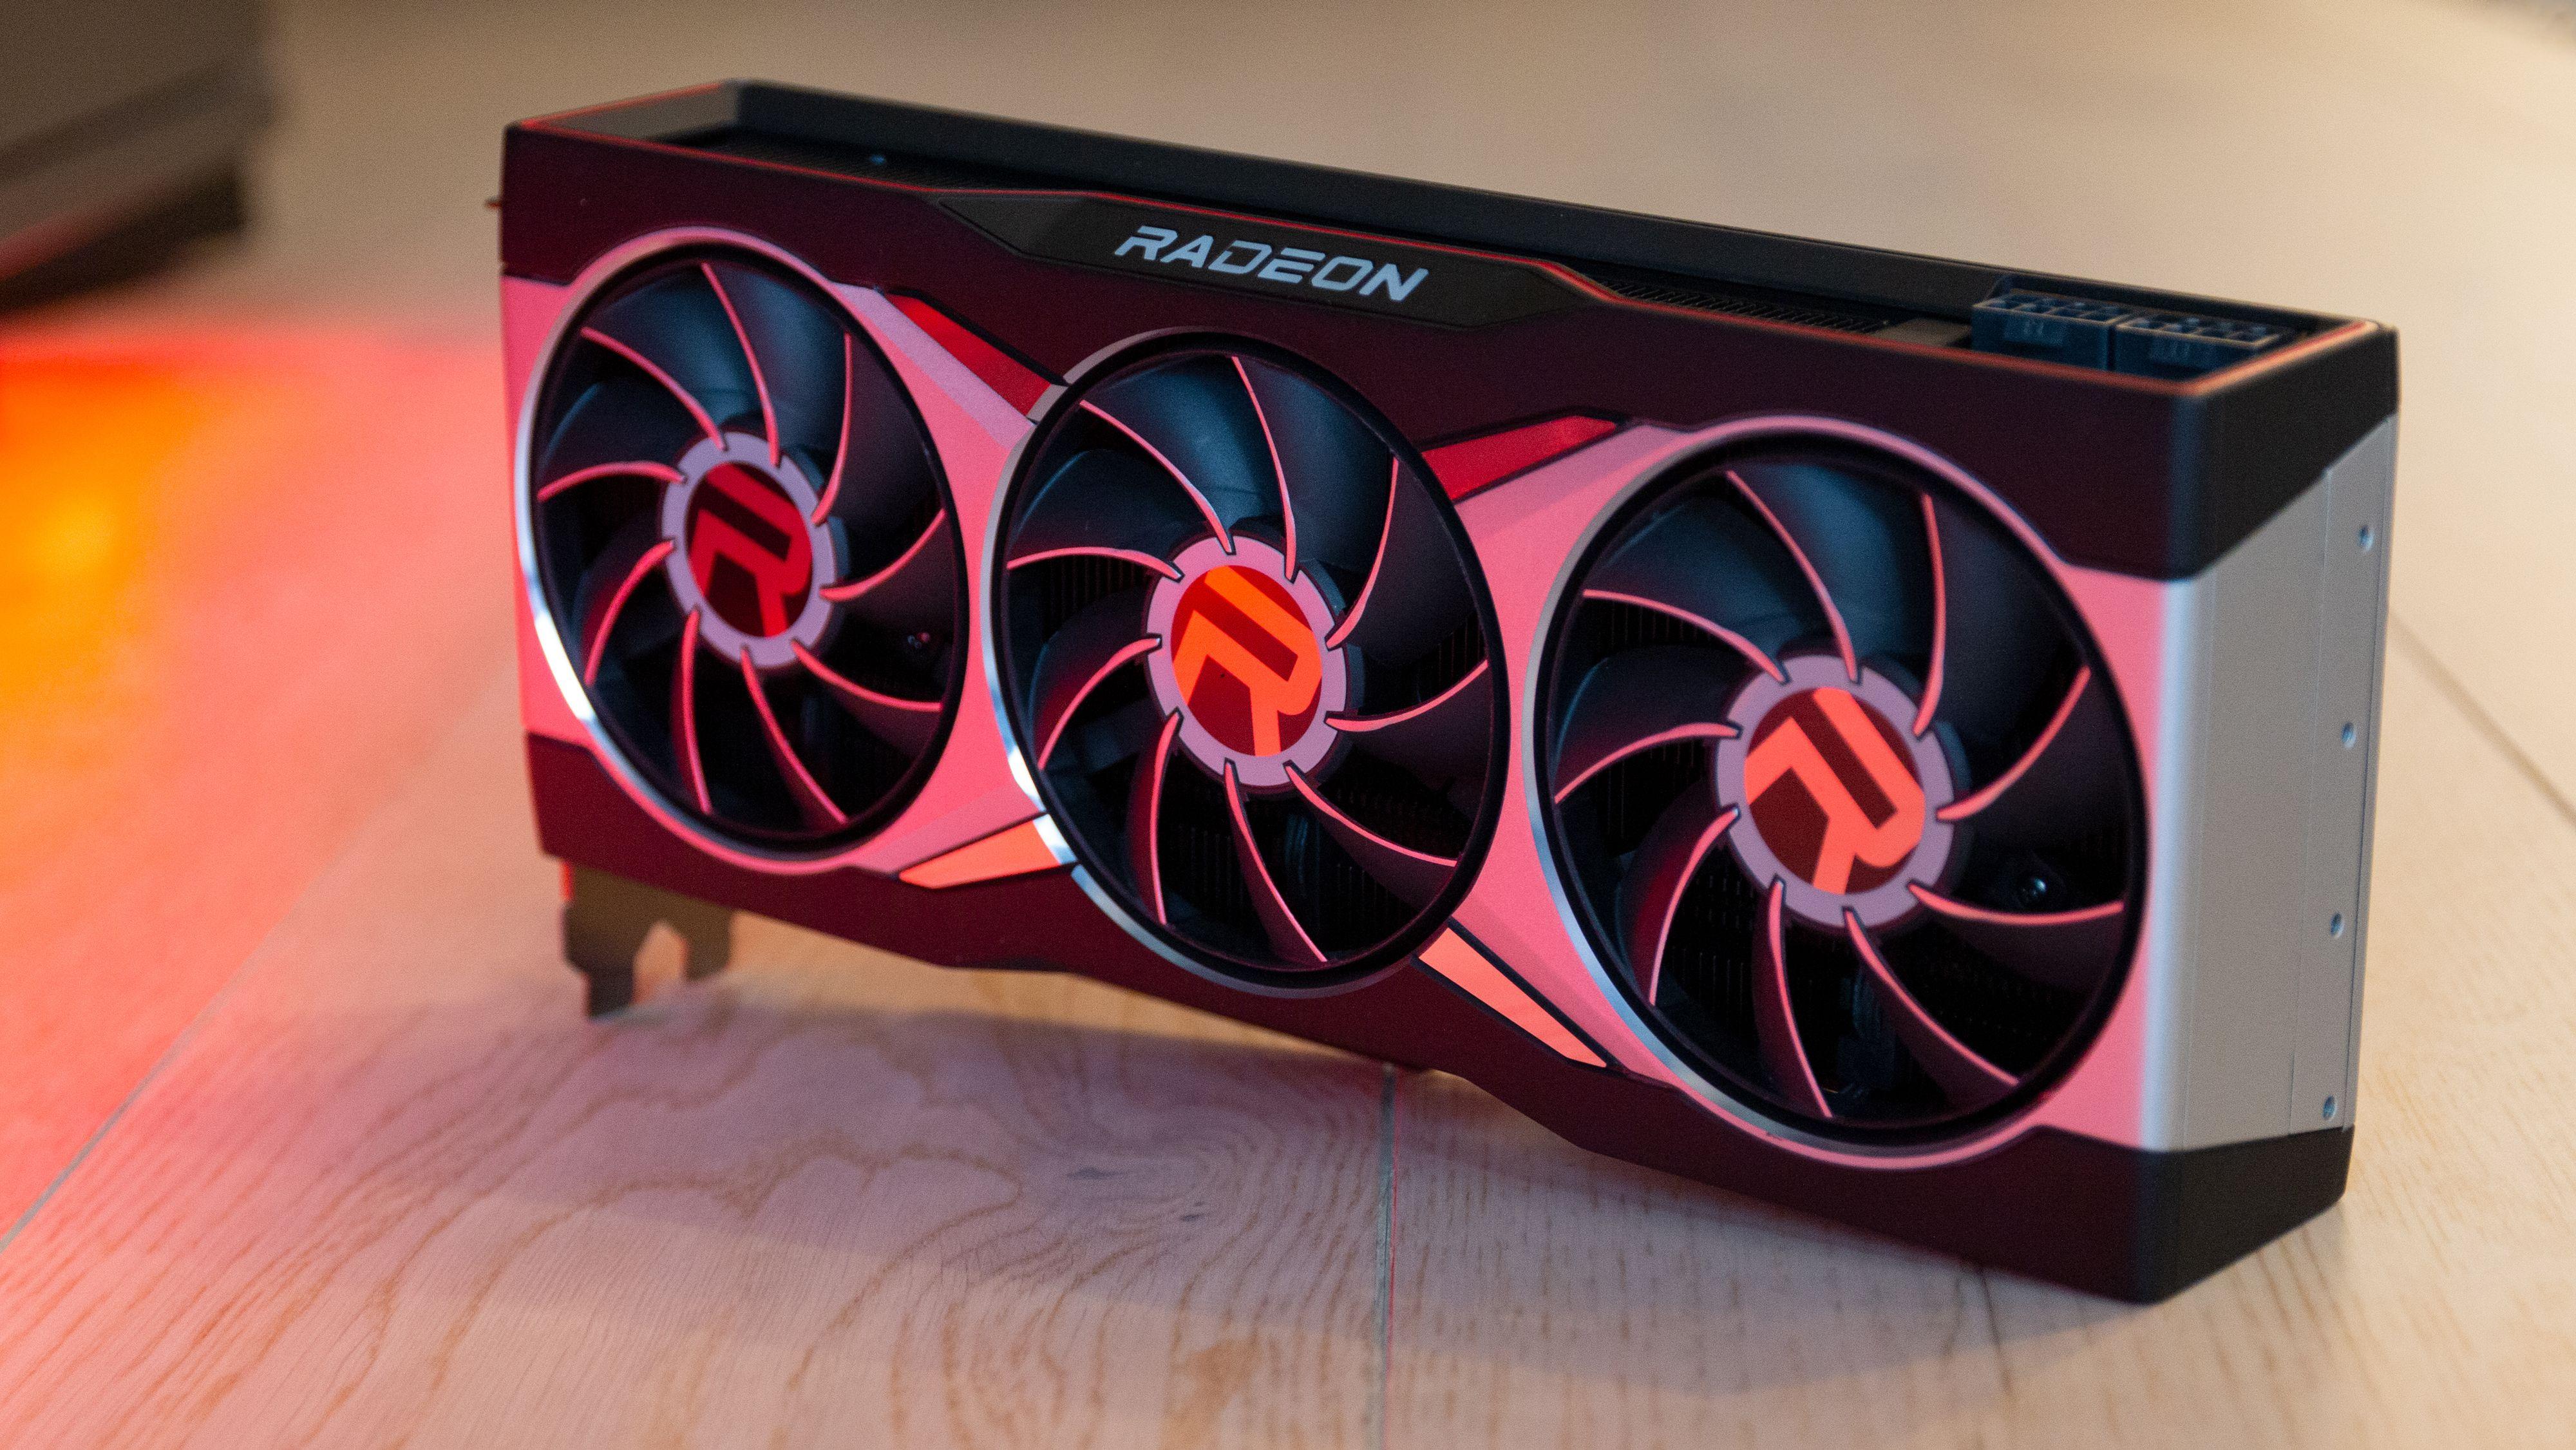 Radeon RX 6800 XT.